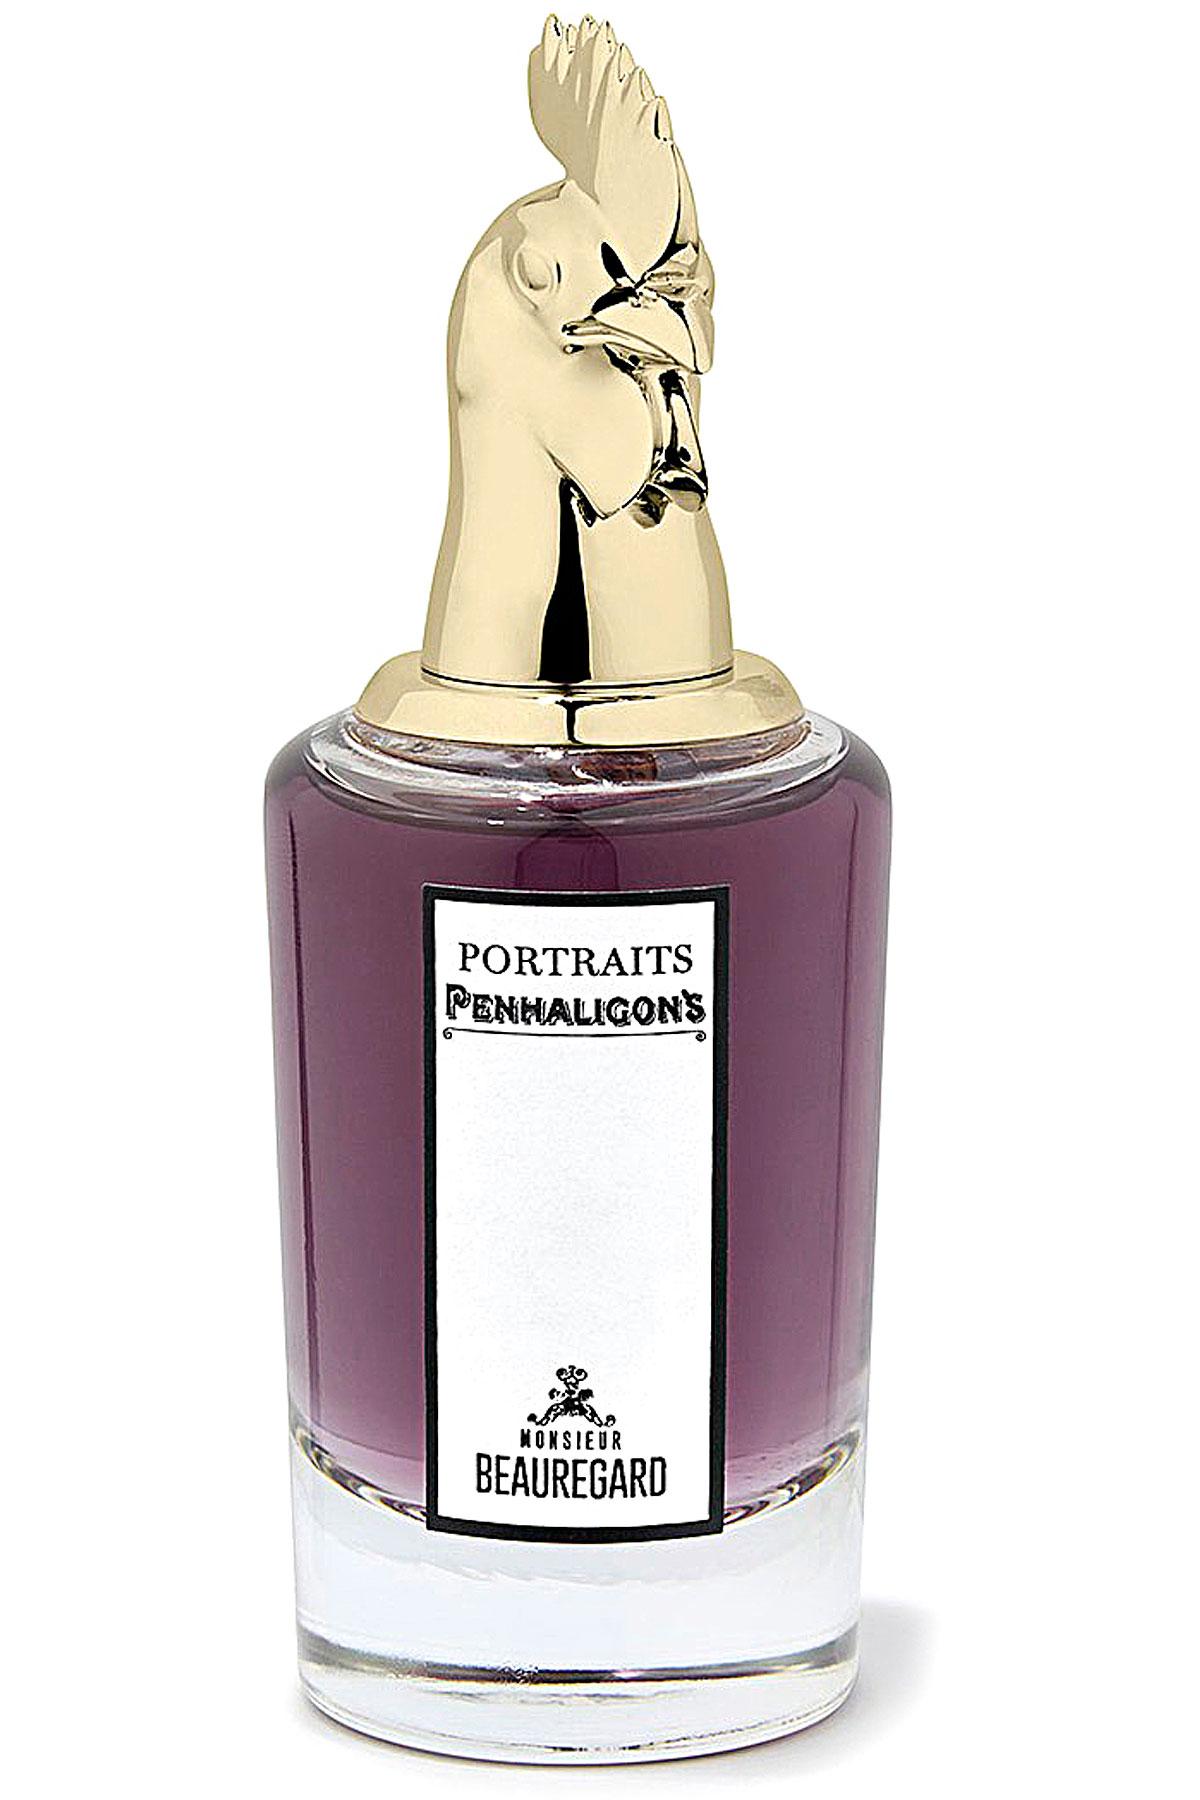 Penhaligon s London Fragrances for Men, Monsieur Beauregard - Eau De Parfum - 75 Ml, 2019, 75 ml